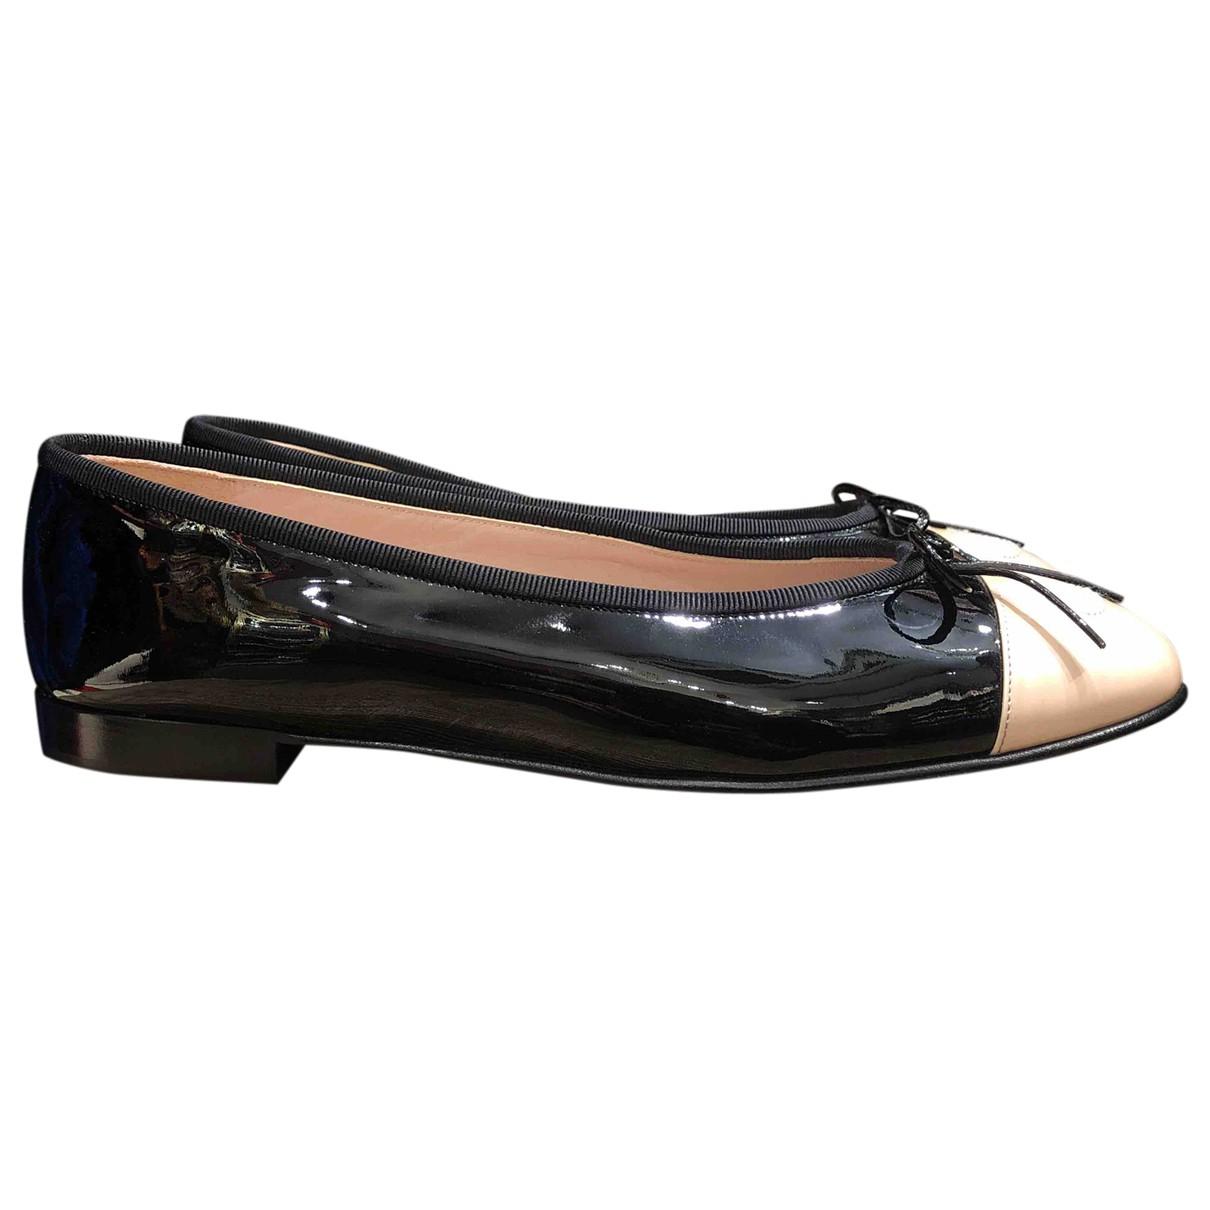 Chanel N Black Patent leather Ballet flats for Women 40 EU